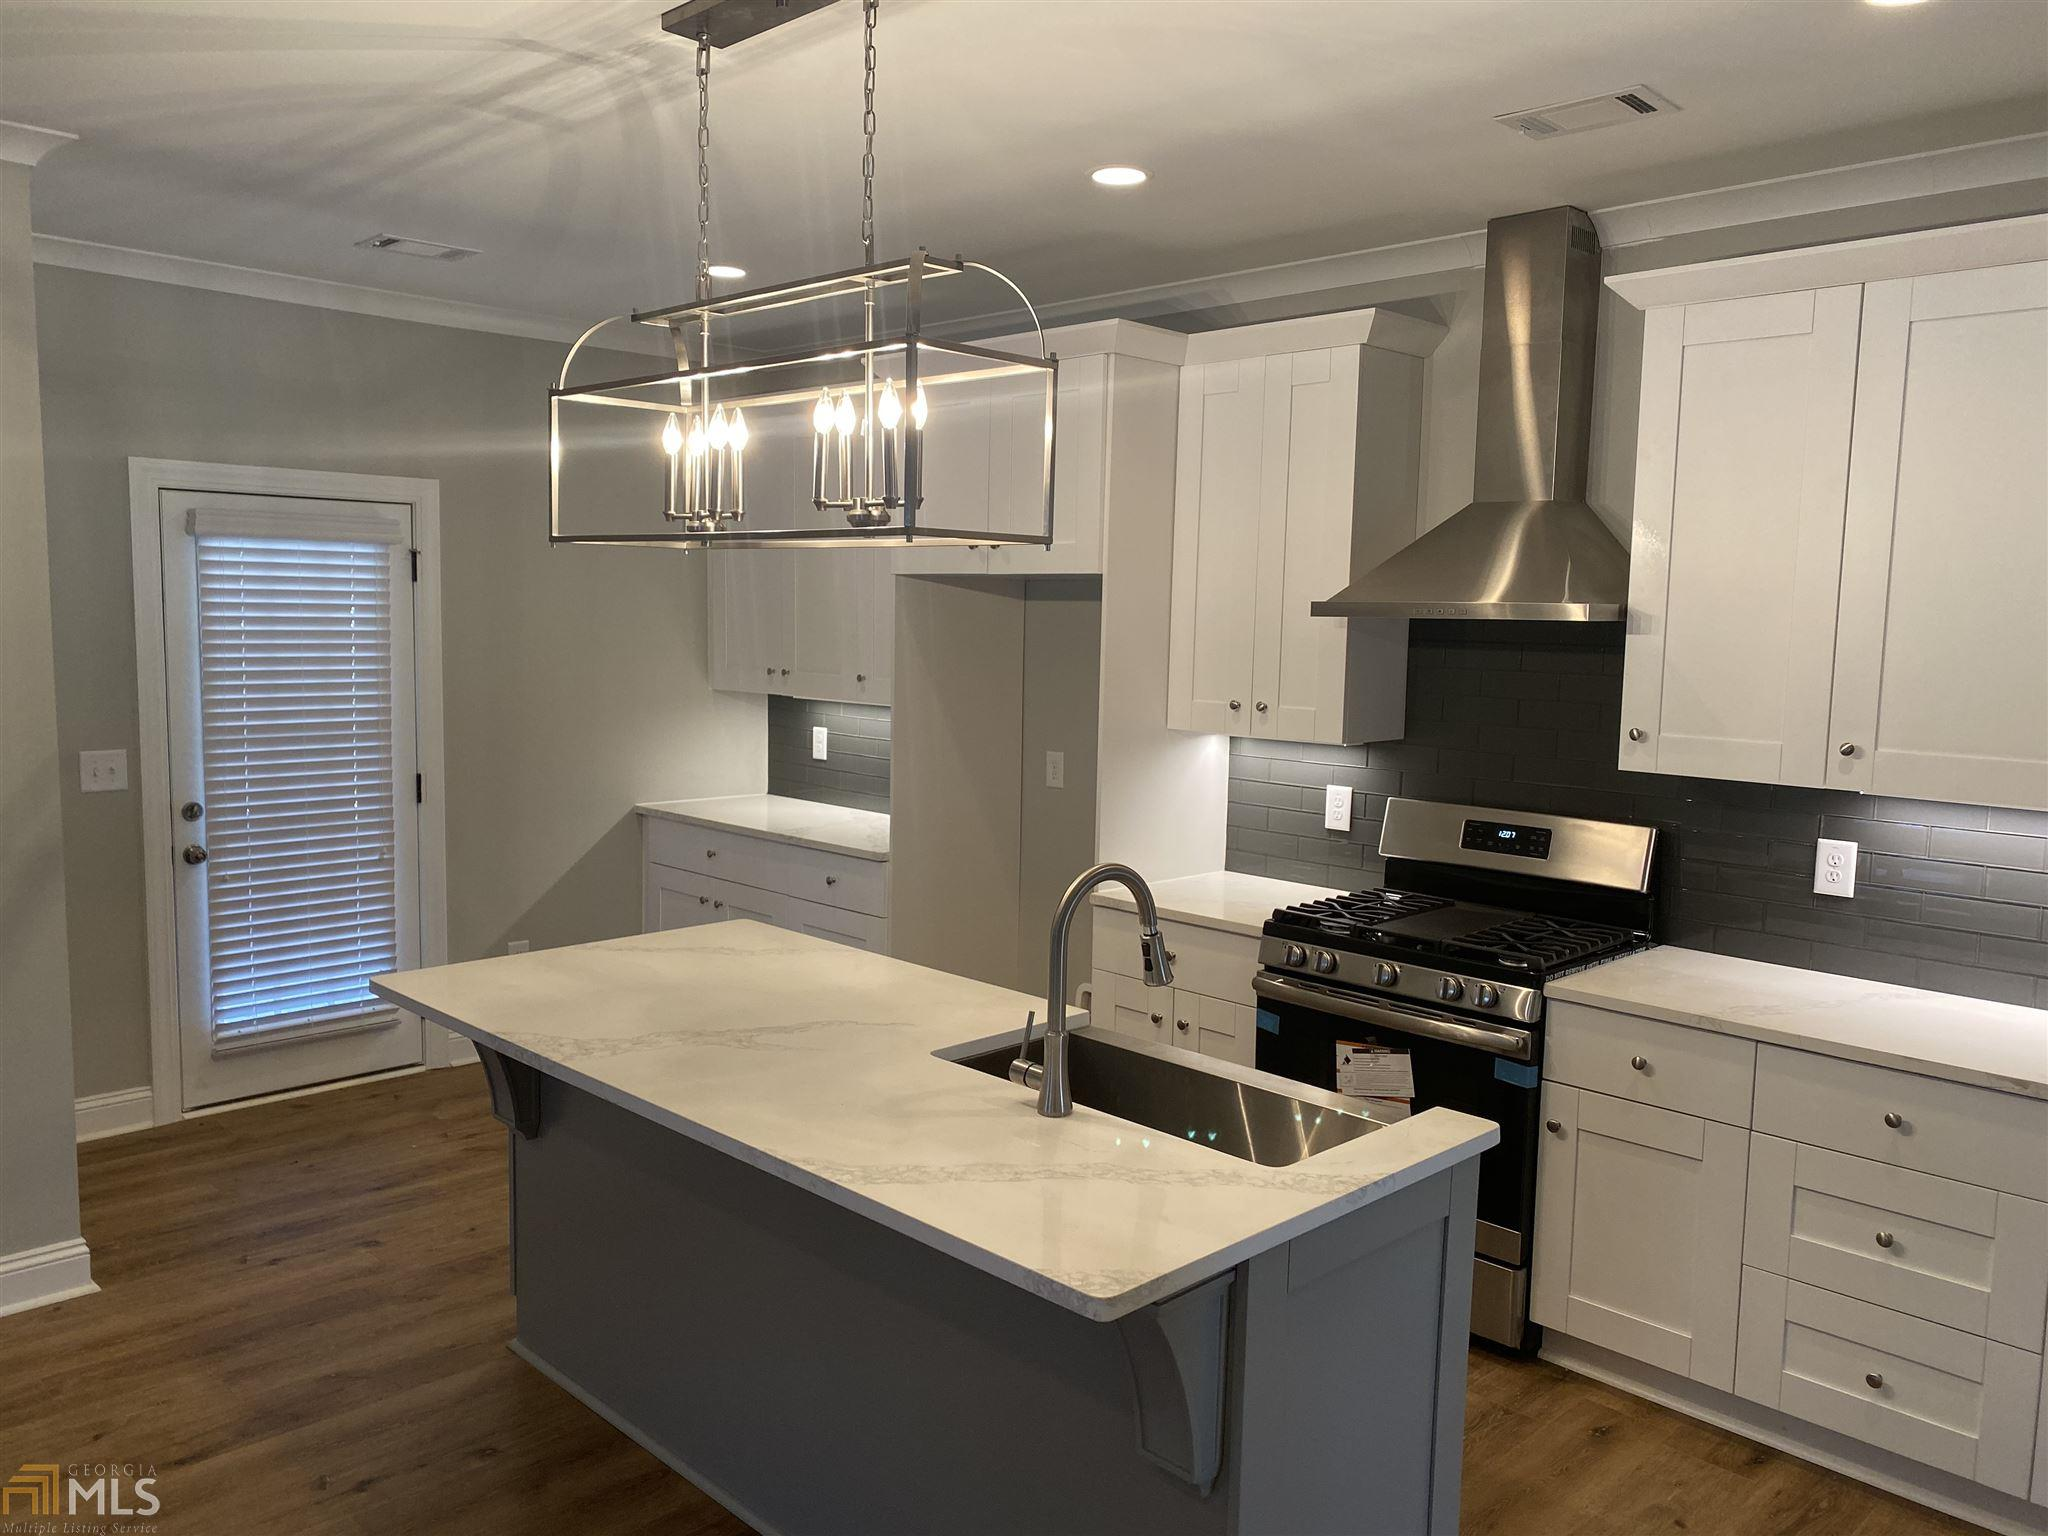 105 Hunley Lane, Lilburn, Georgia 30047, 5 Bedrooms Bedrooms, ,3 BathroomsBathrooms,Single Family,For Sale,105 Hunley Lane,2,8824437